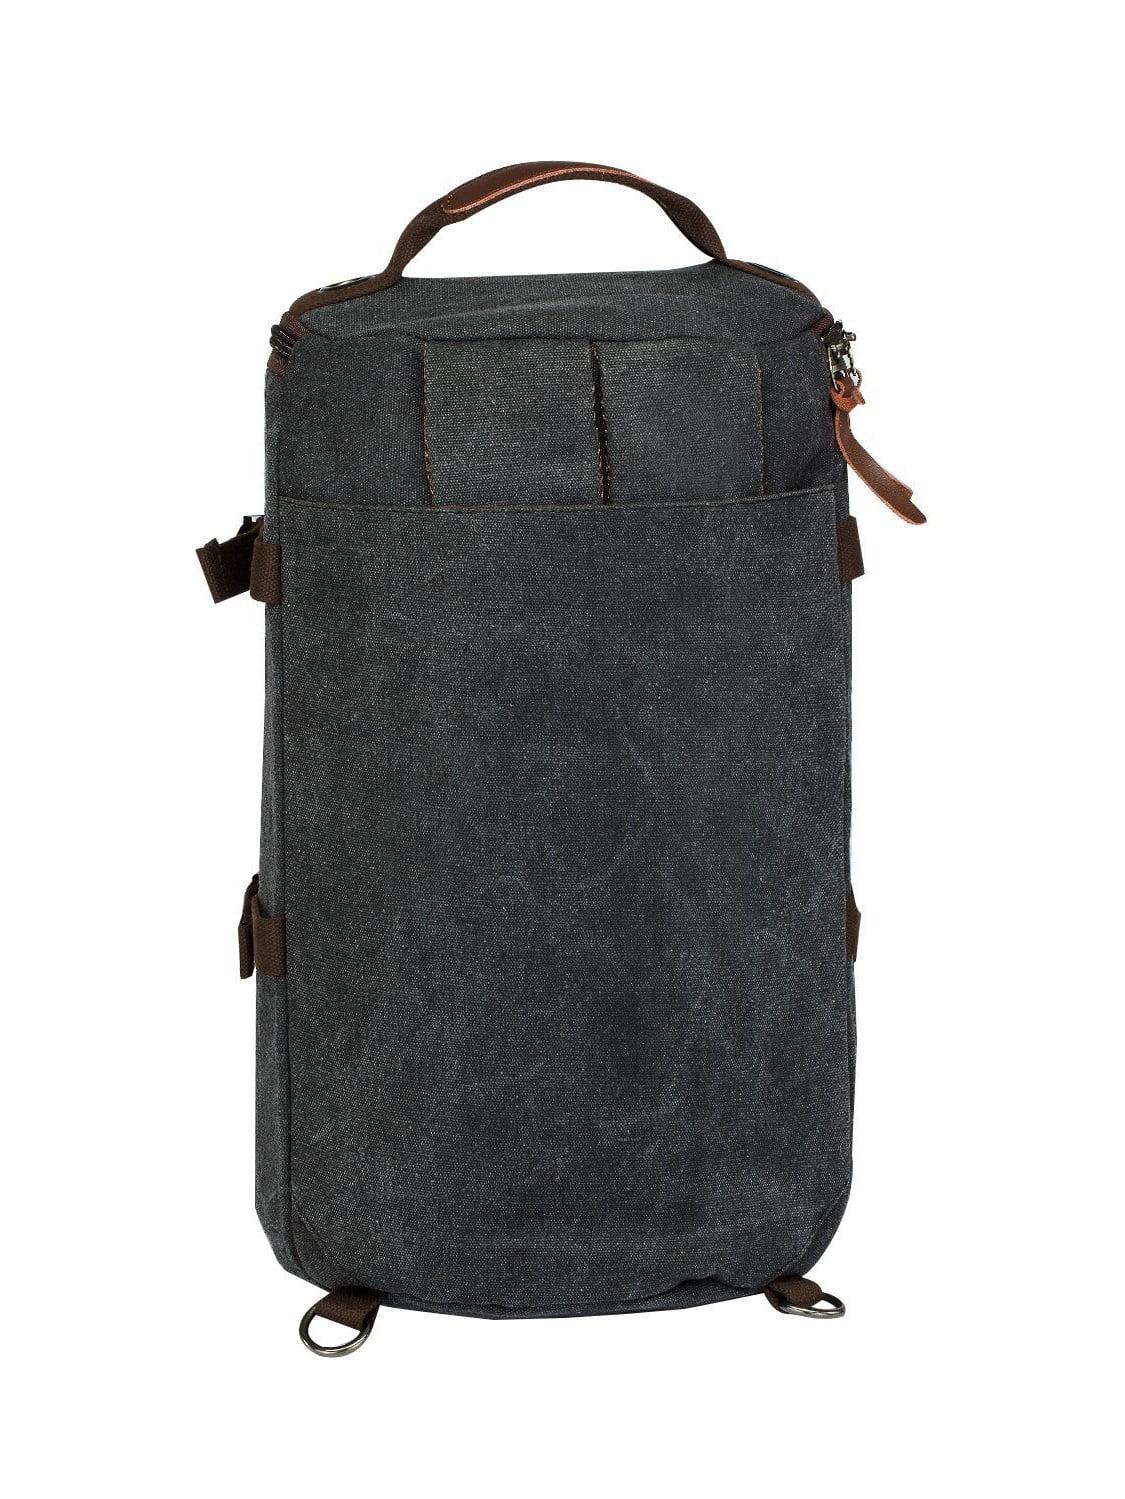 50bb7c5a42 LUXUR Retro Duffel 30L Cylinder Bag Canvas Travel Backpack Hiking Shoulder  Handbag - Walmart.com